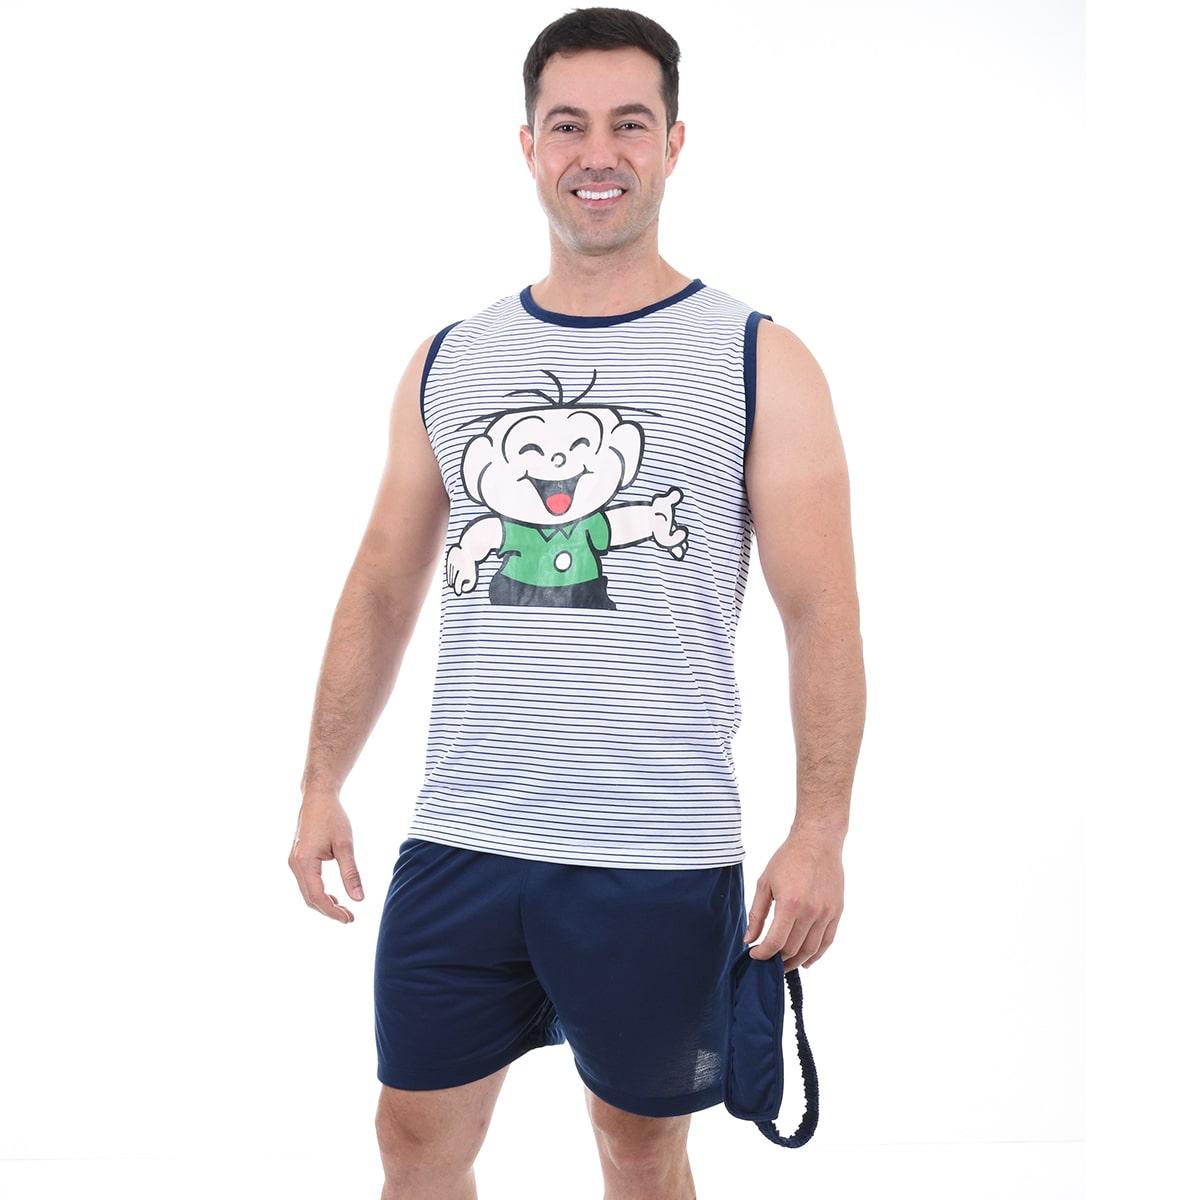 Pijama Masculino Adulto Regata Short Tapa Olho Cebolinha Turma da Mônica 433